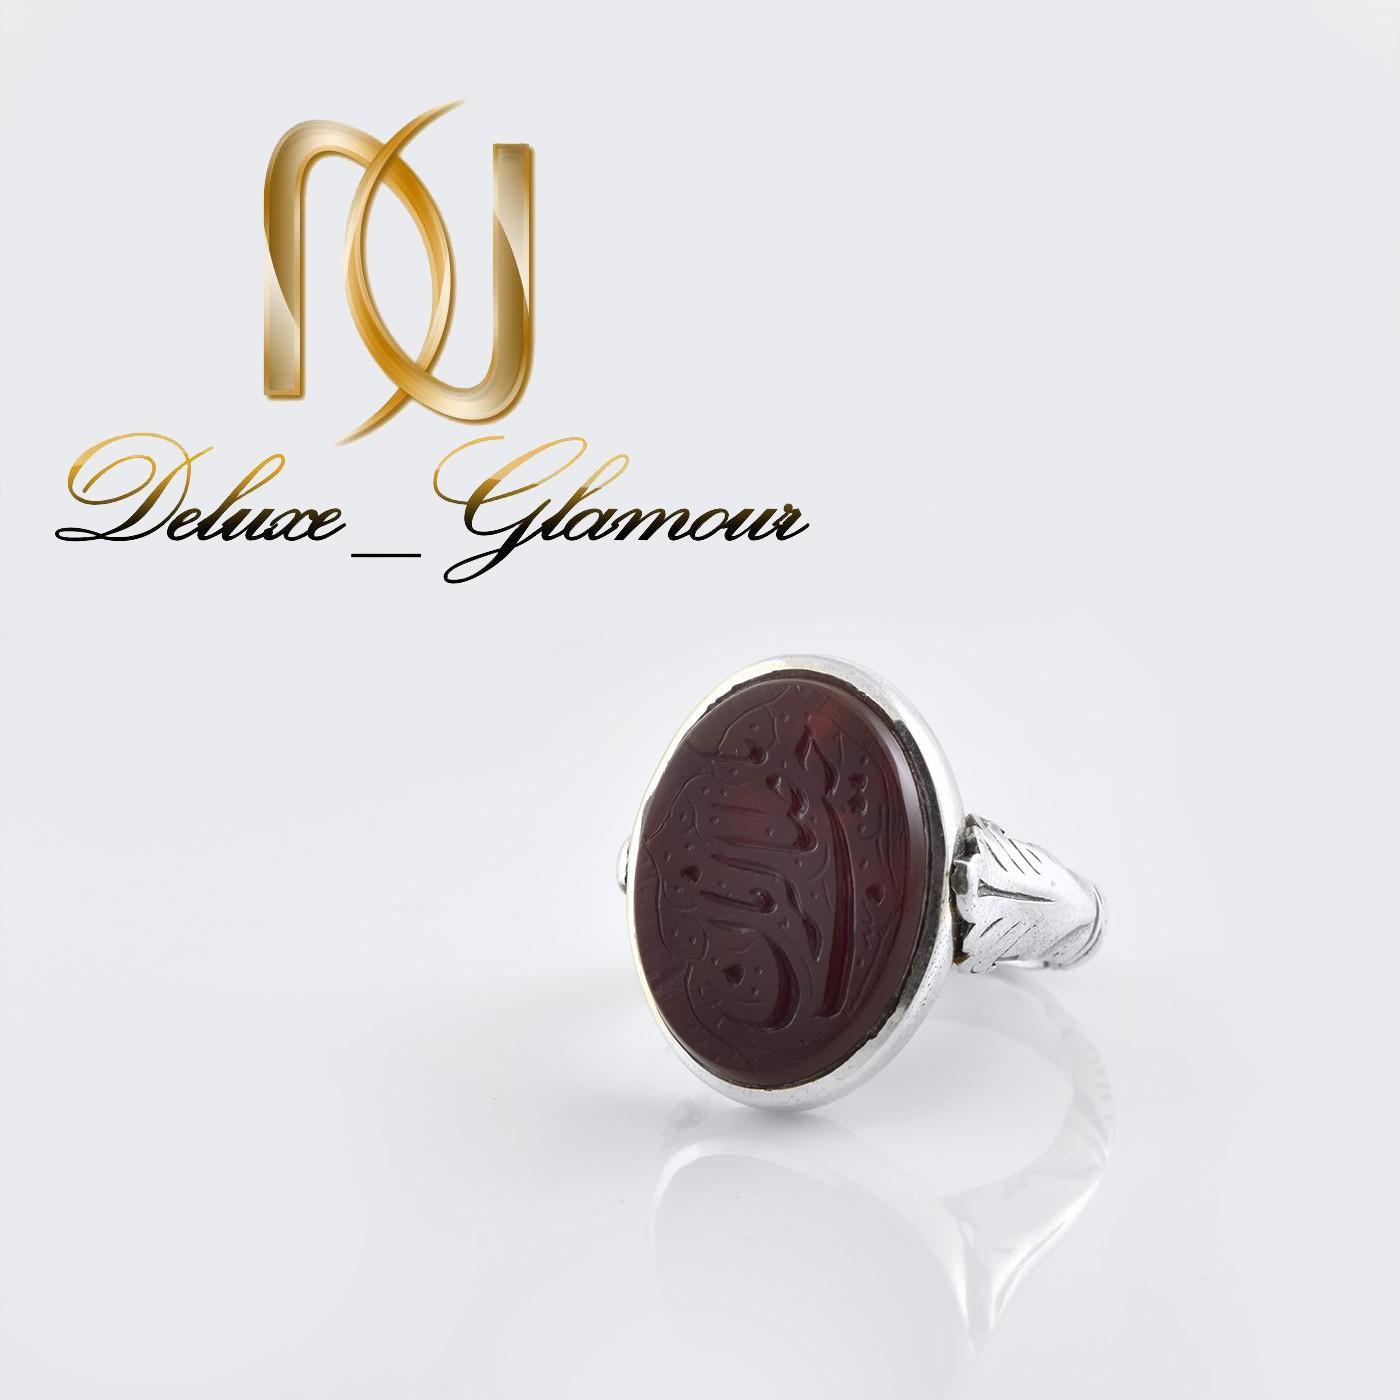 انگشتر مردانه نقره با سنگ عقیق سرخ اصلش rg-n283